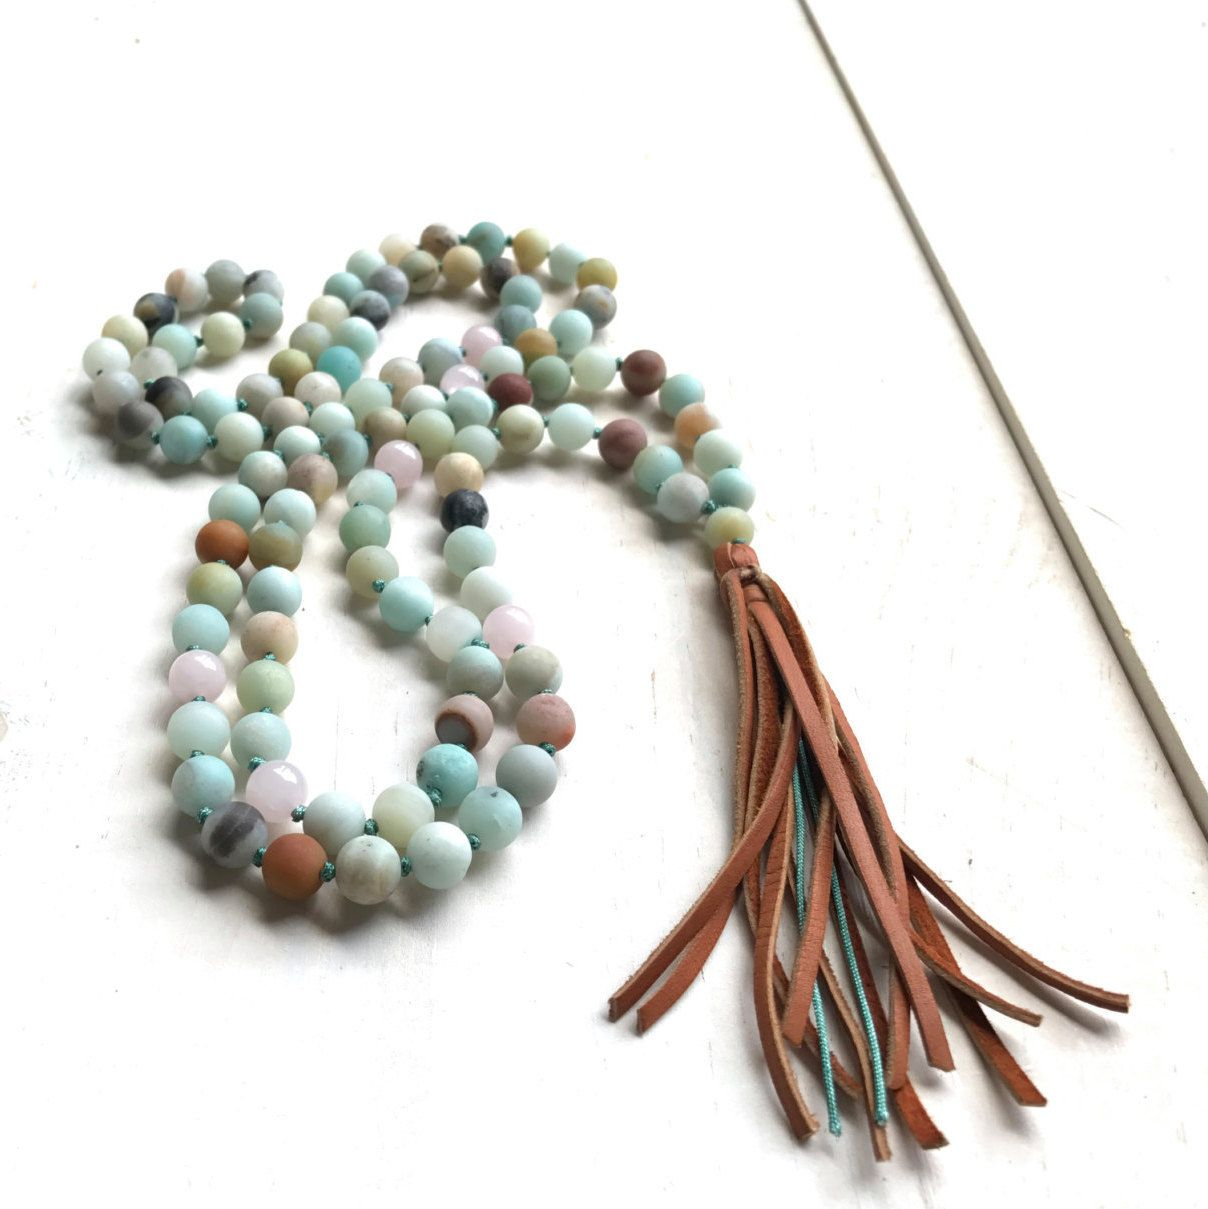 Leather Tassel Mala Beads Amazonite Mala Necklace 108 Bead Mala